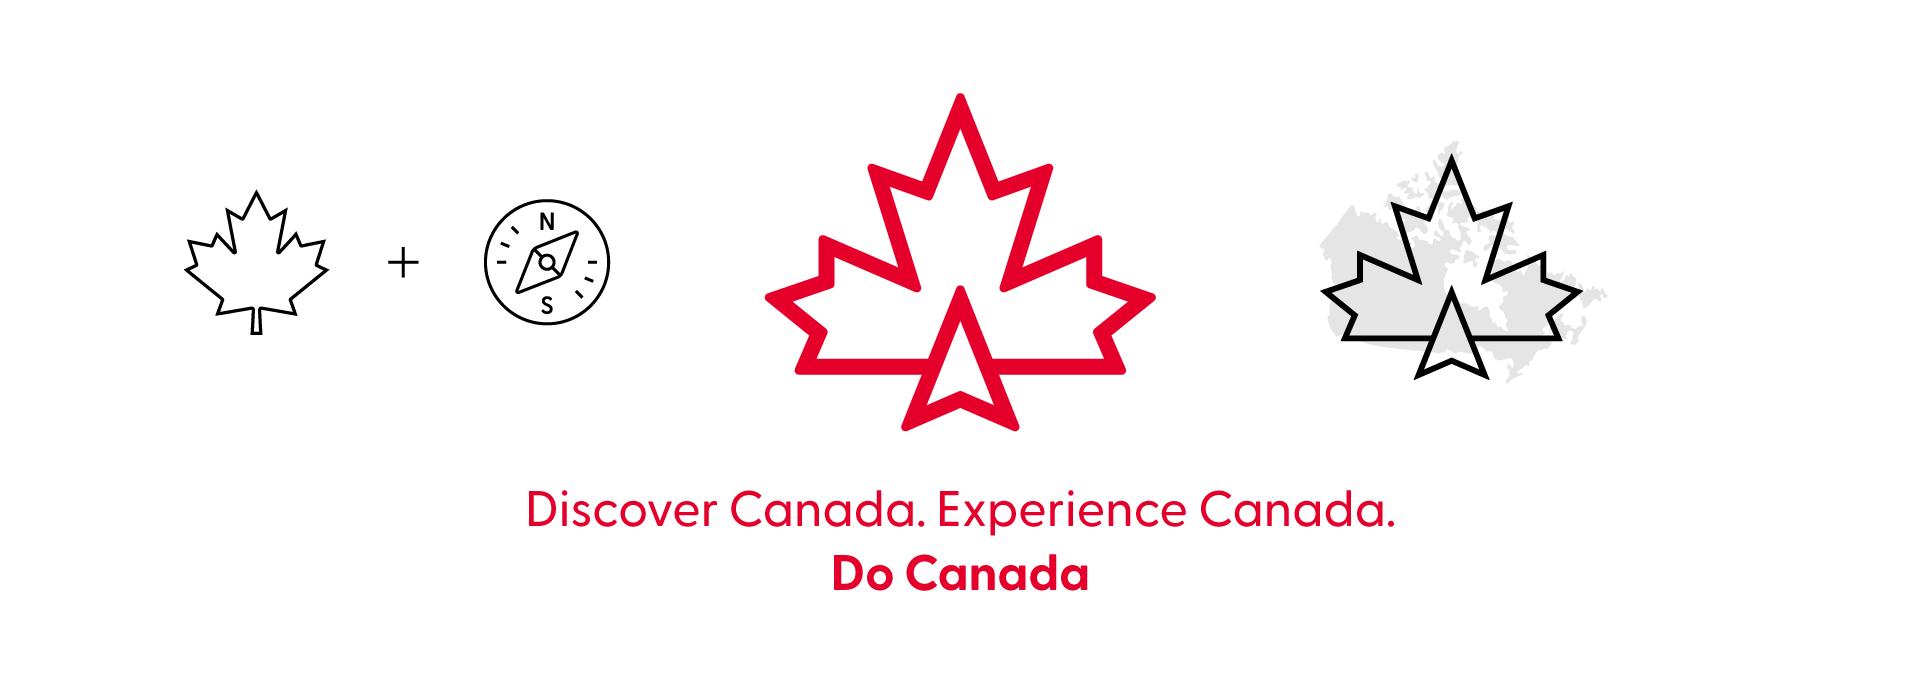 must-do-canada-logo-blueprint